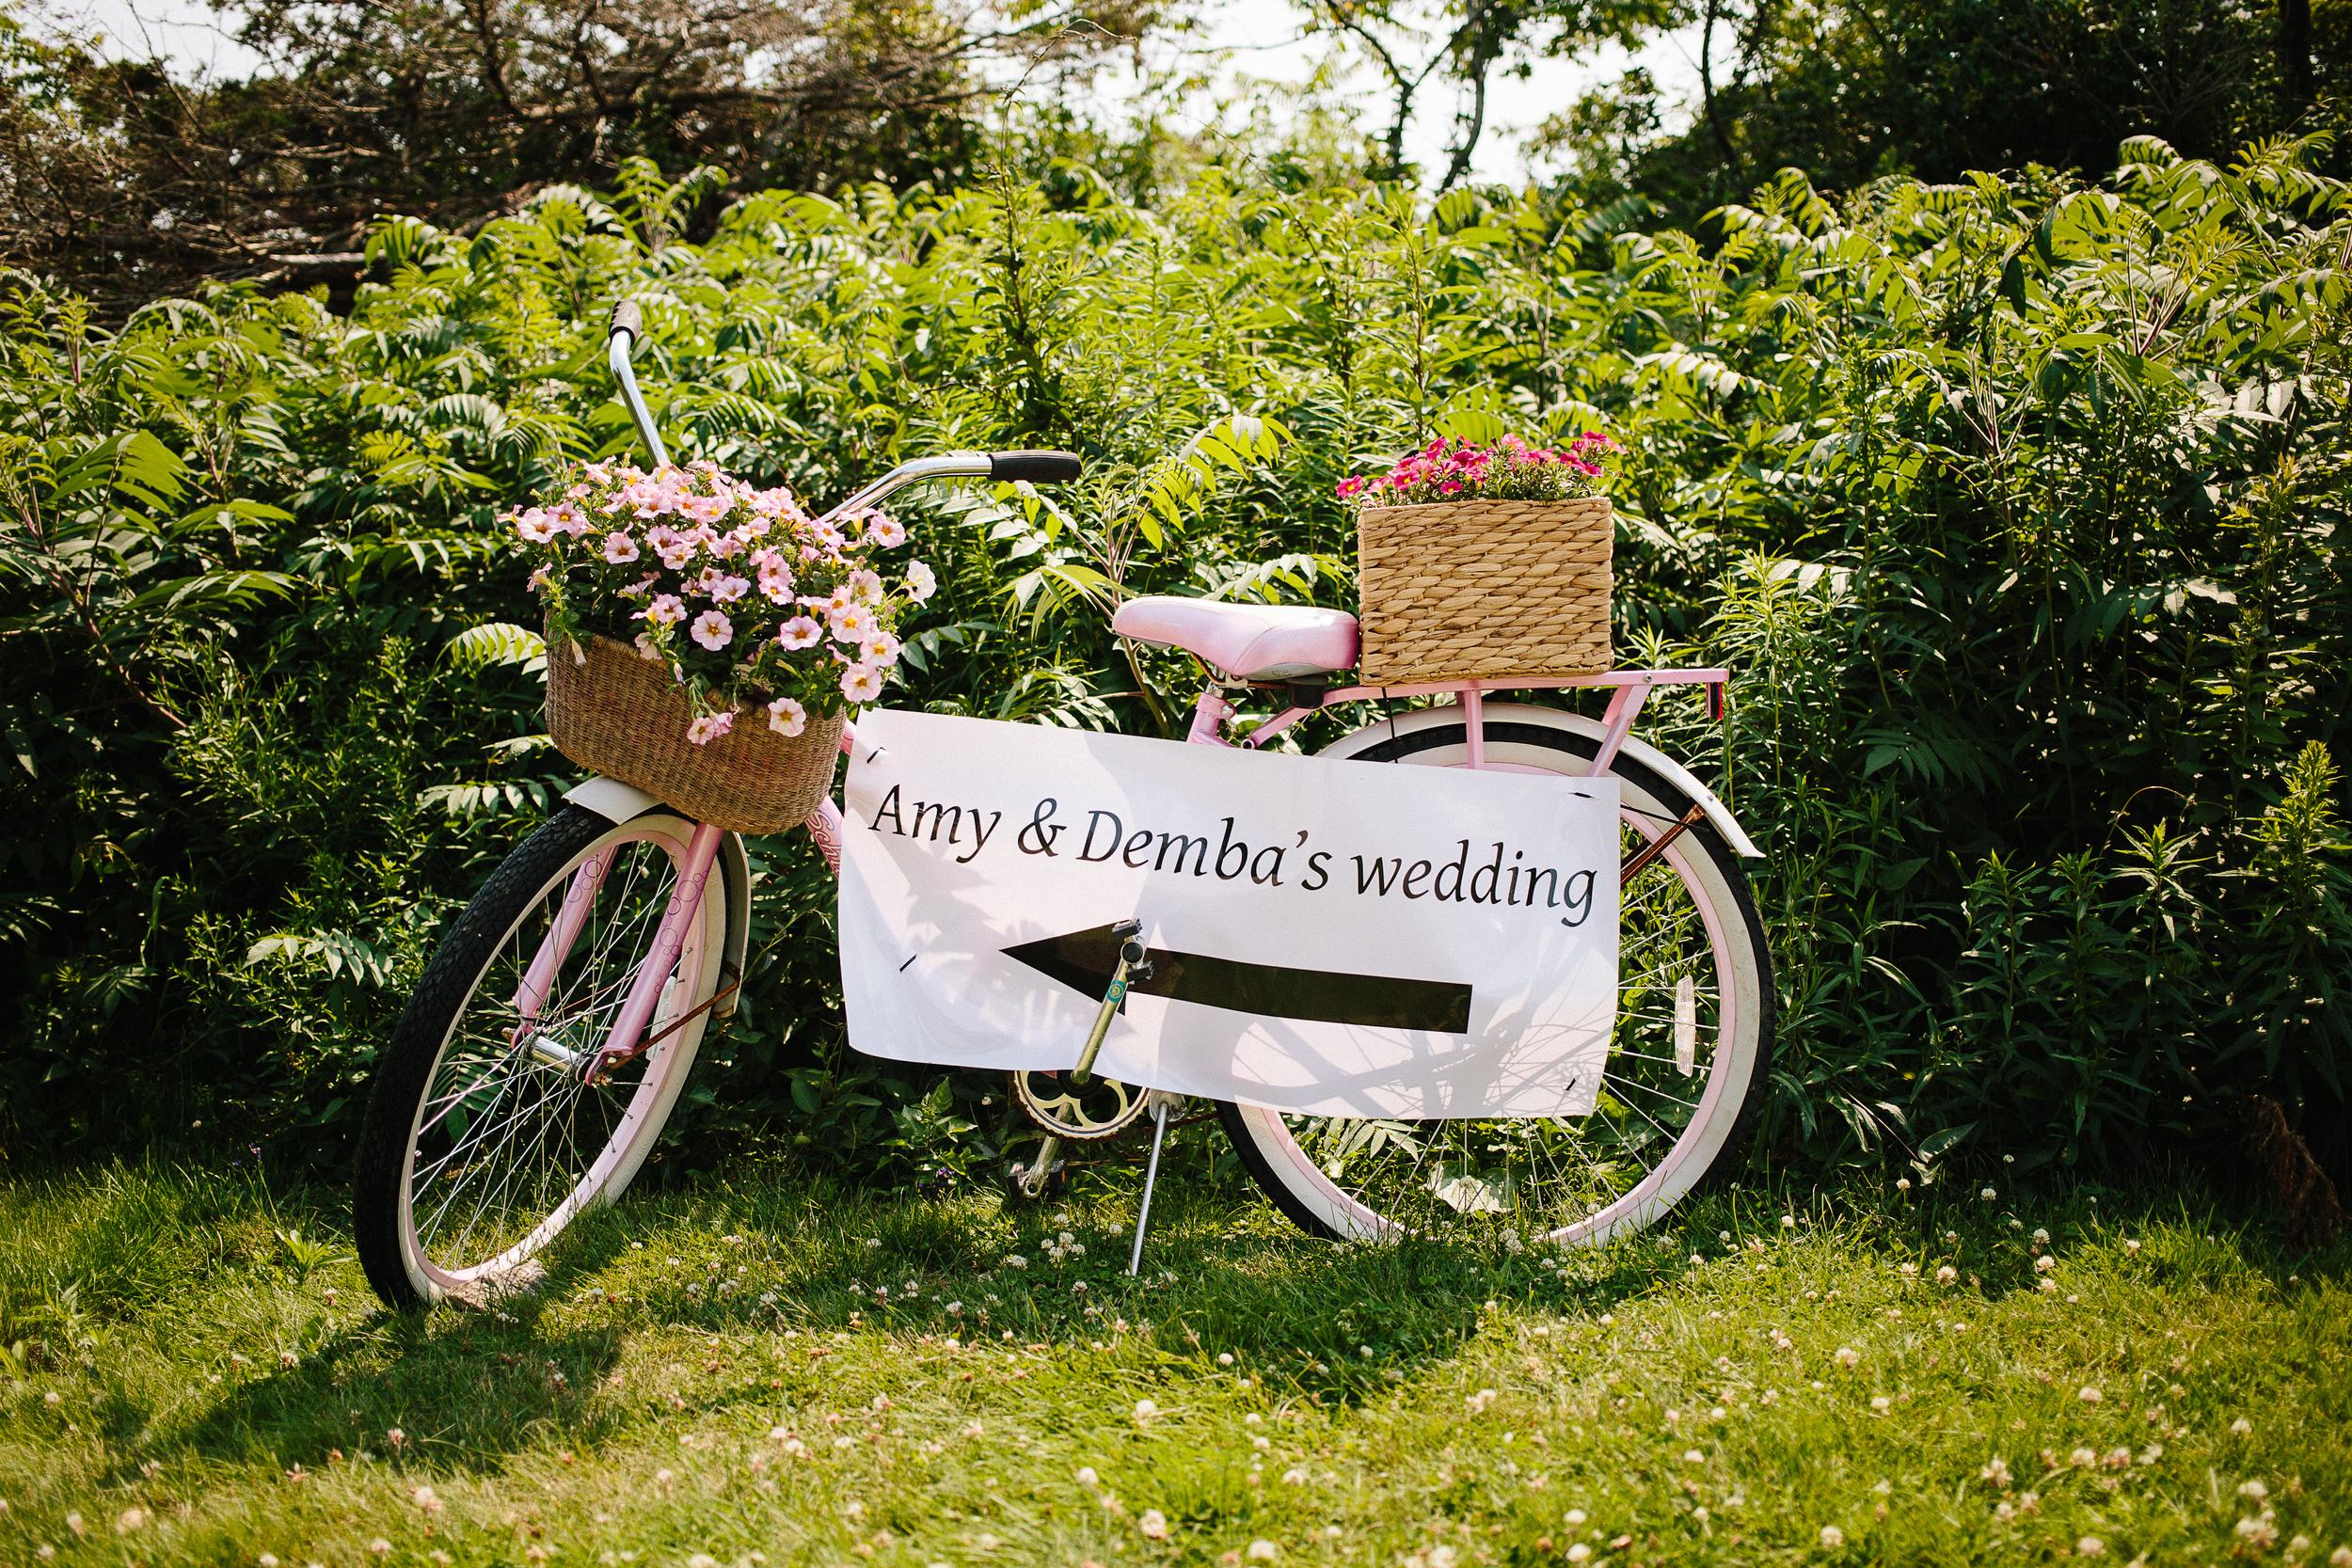 Amy&Demba_medprint_July2015_jenniferleahyphotography-020.jpg